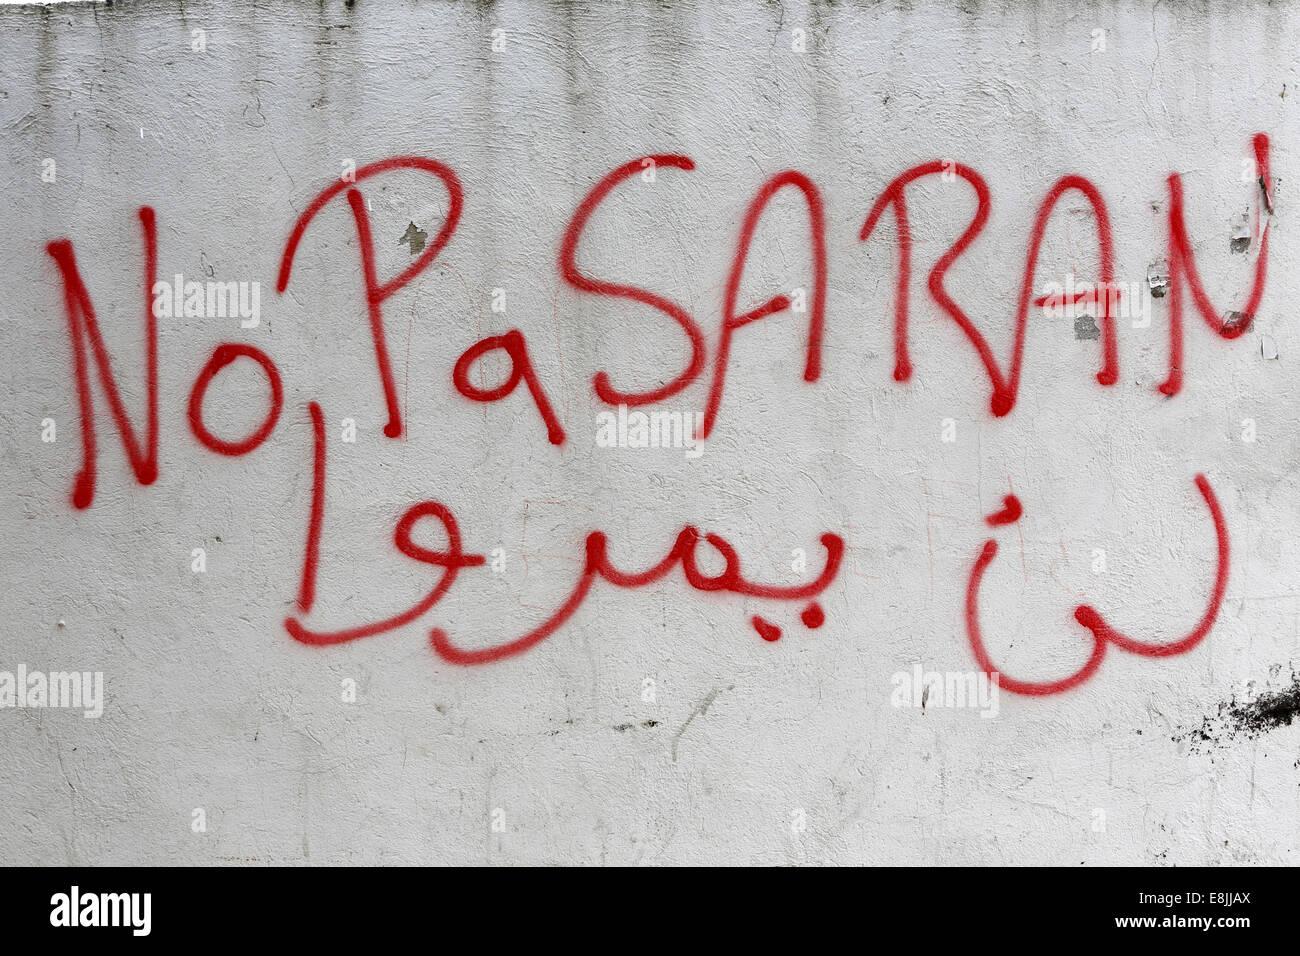 no pasaran graffiti in tunis stock photo 74168274 alamy